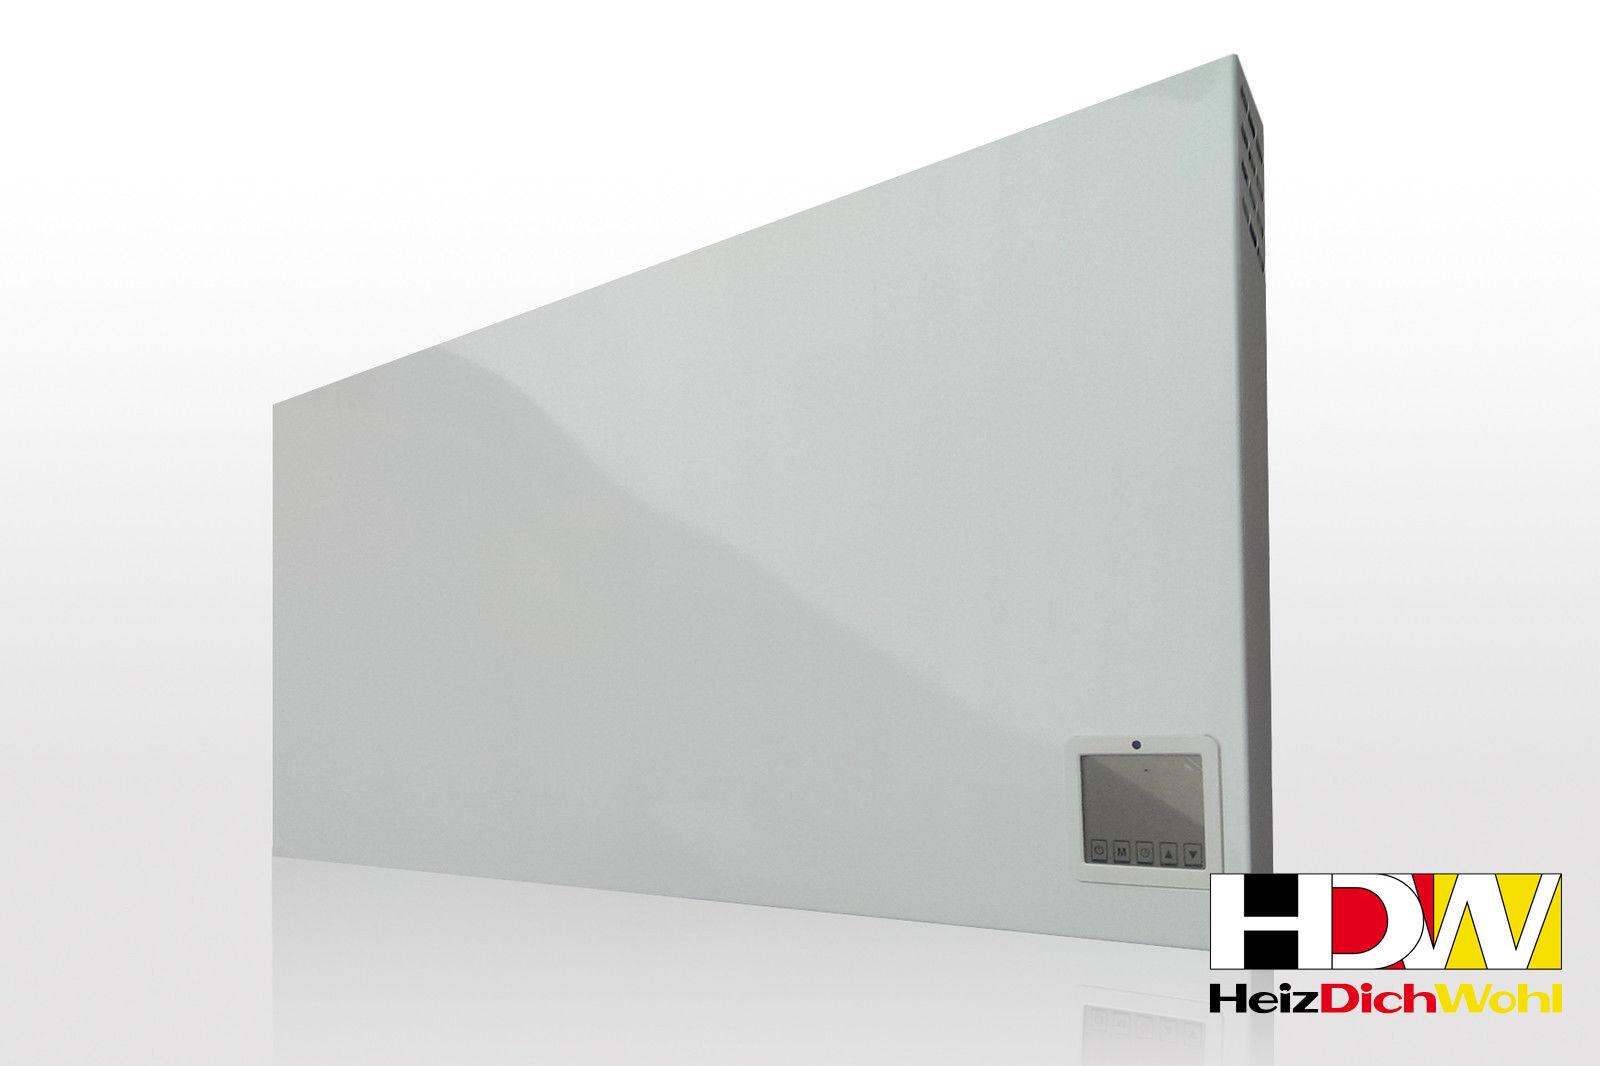 infrarotheizung 750 f w konvektionsheizung thermostatregler fernbedinung hdw. Black Bedroom Furniture Sets. Home Design Ideas